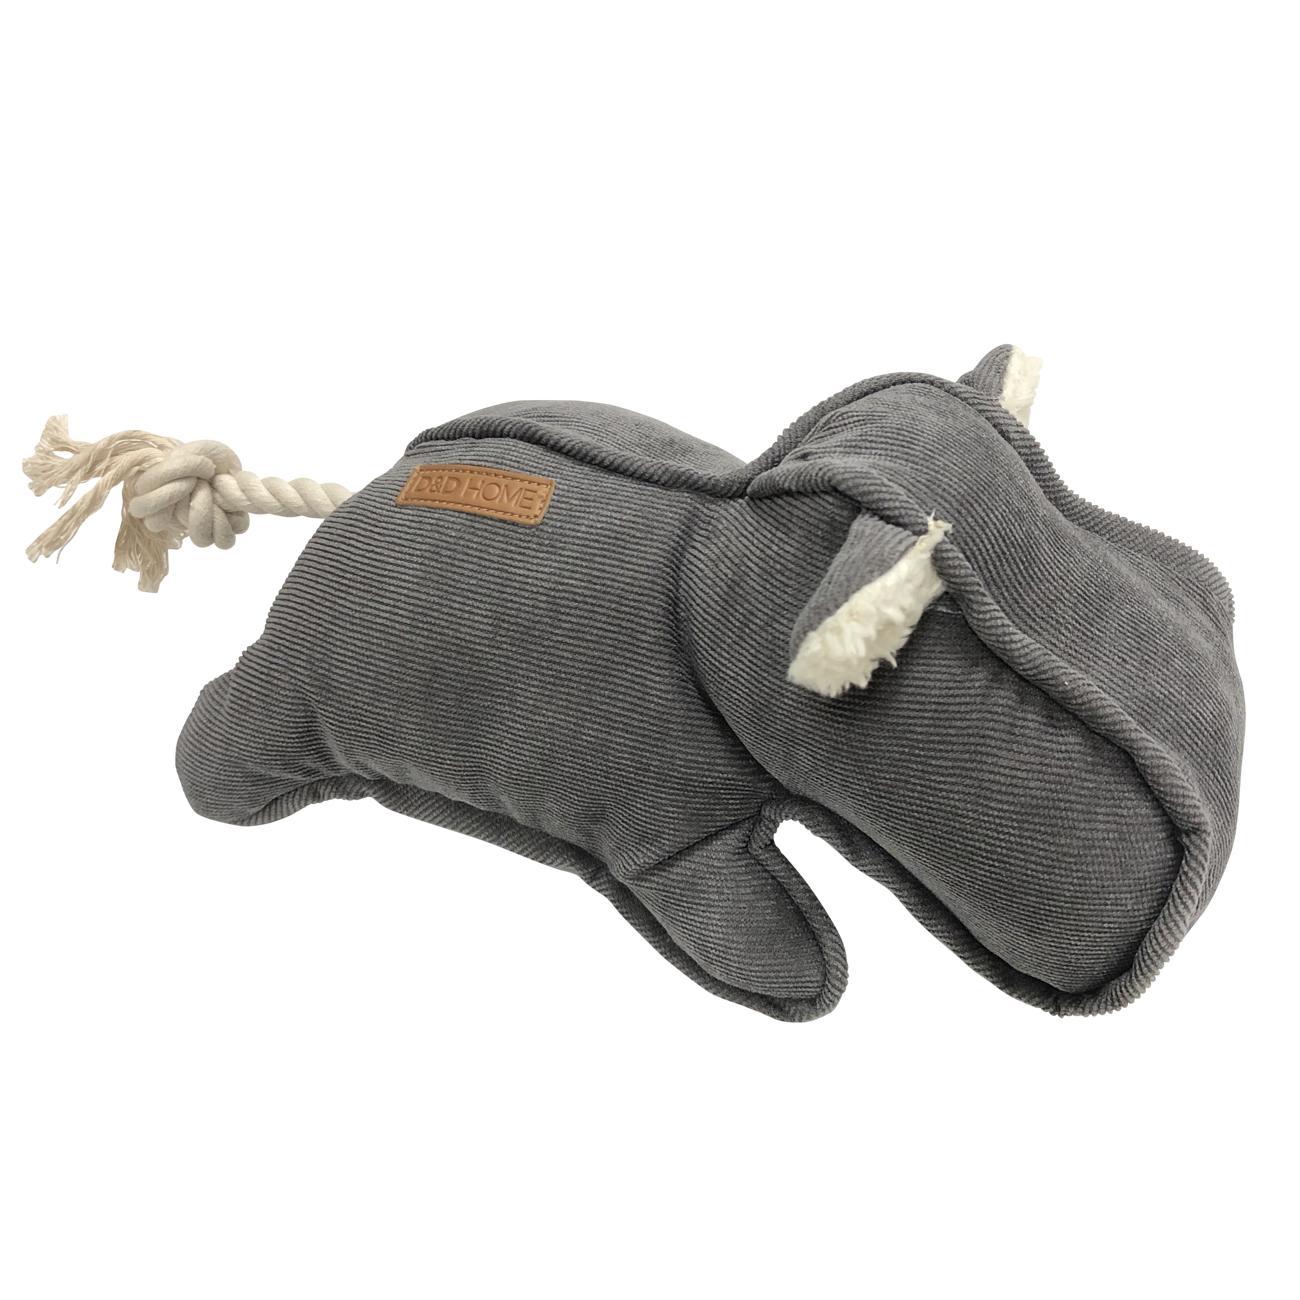 ebi D&D Home Dog Toy - Corduroy